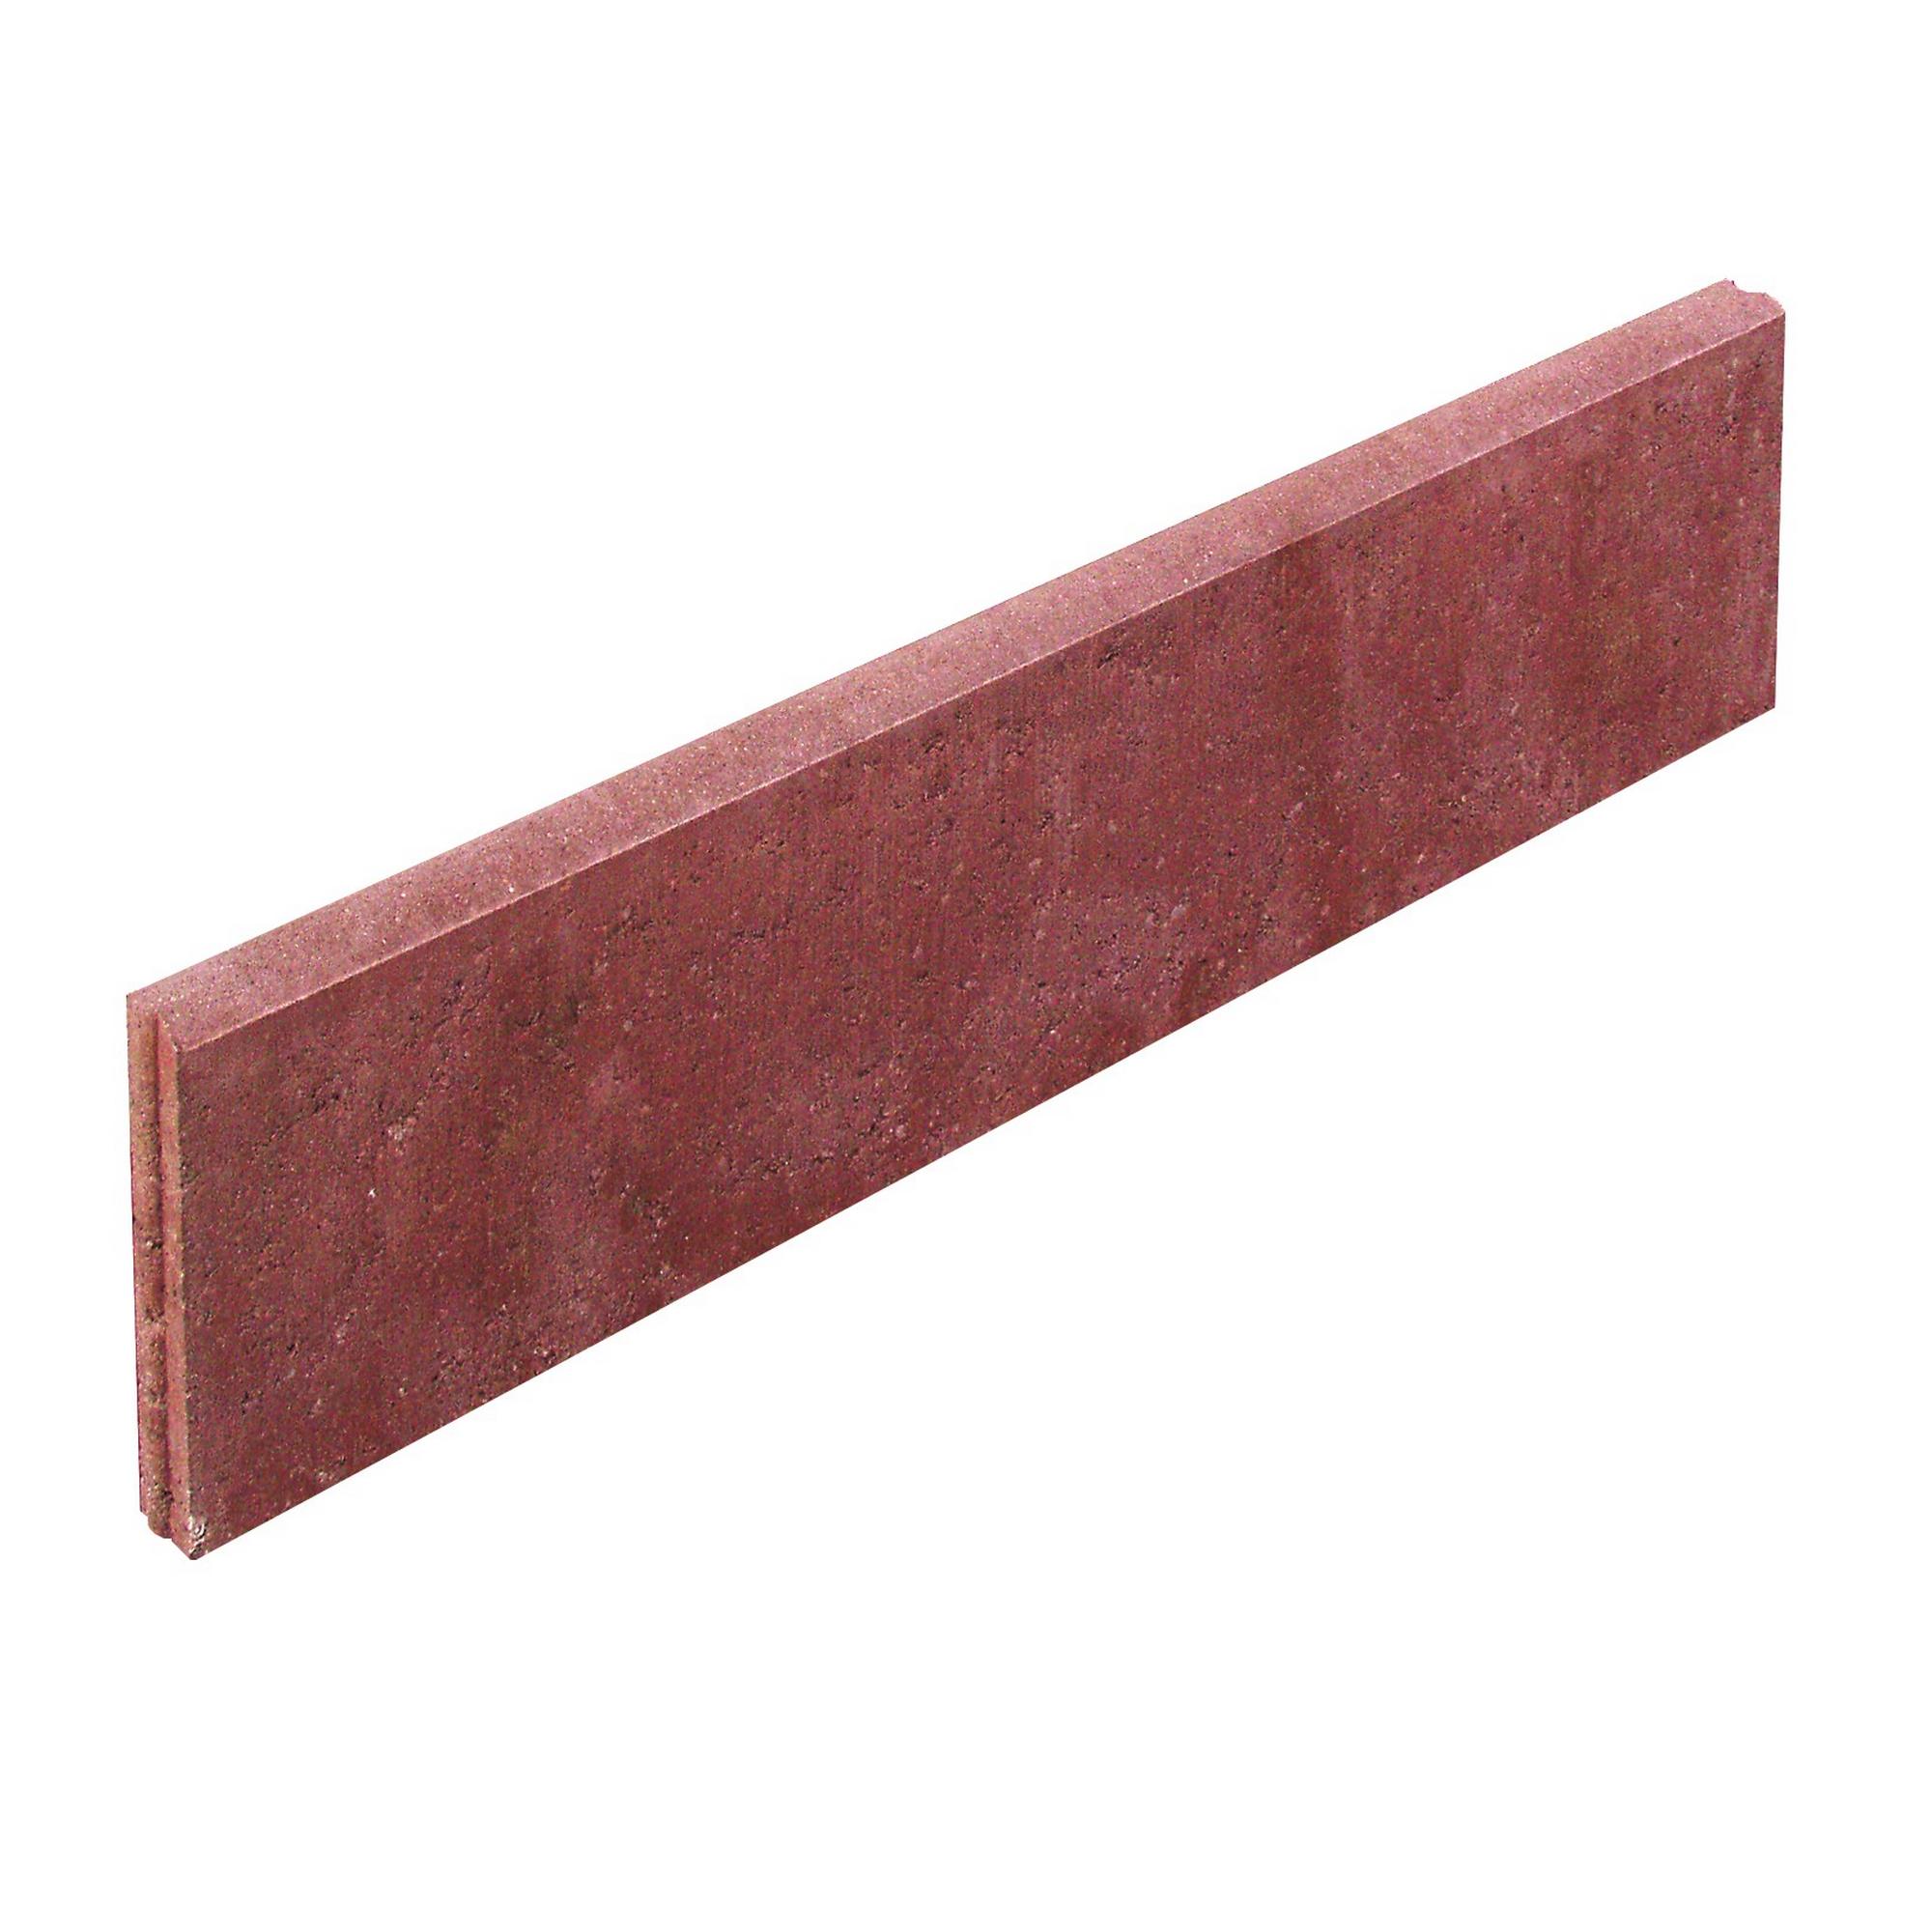 lusit lusit rasenborde rot 5 x 25 x 100 cm toom baumarkt. Black Bedroom Furniture Sets. Home Design Ideas